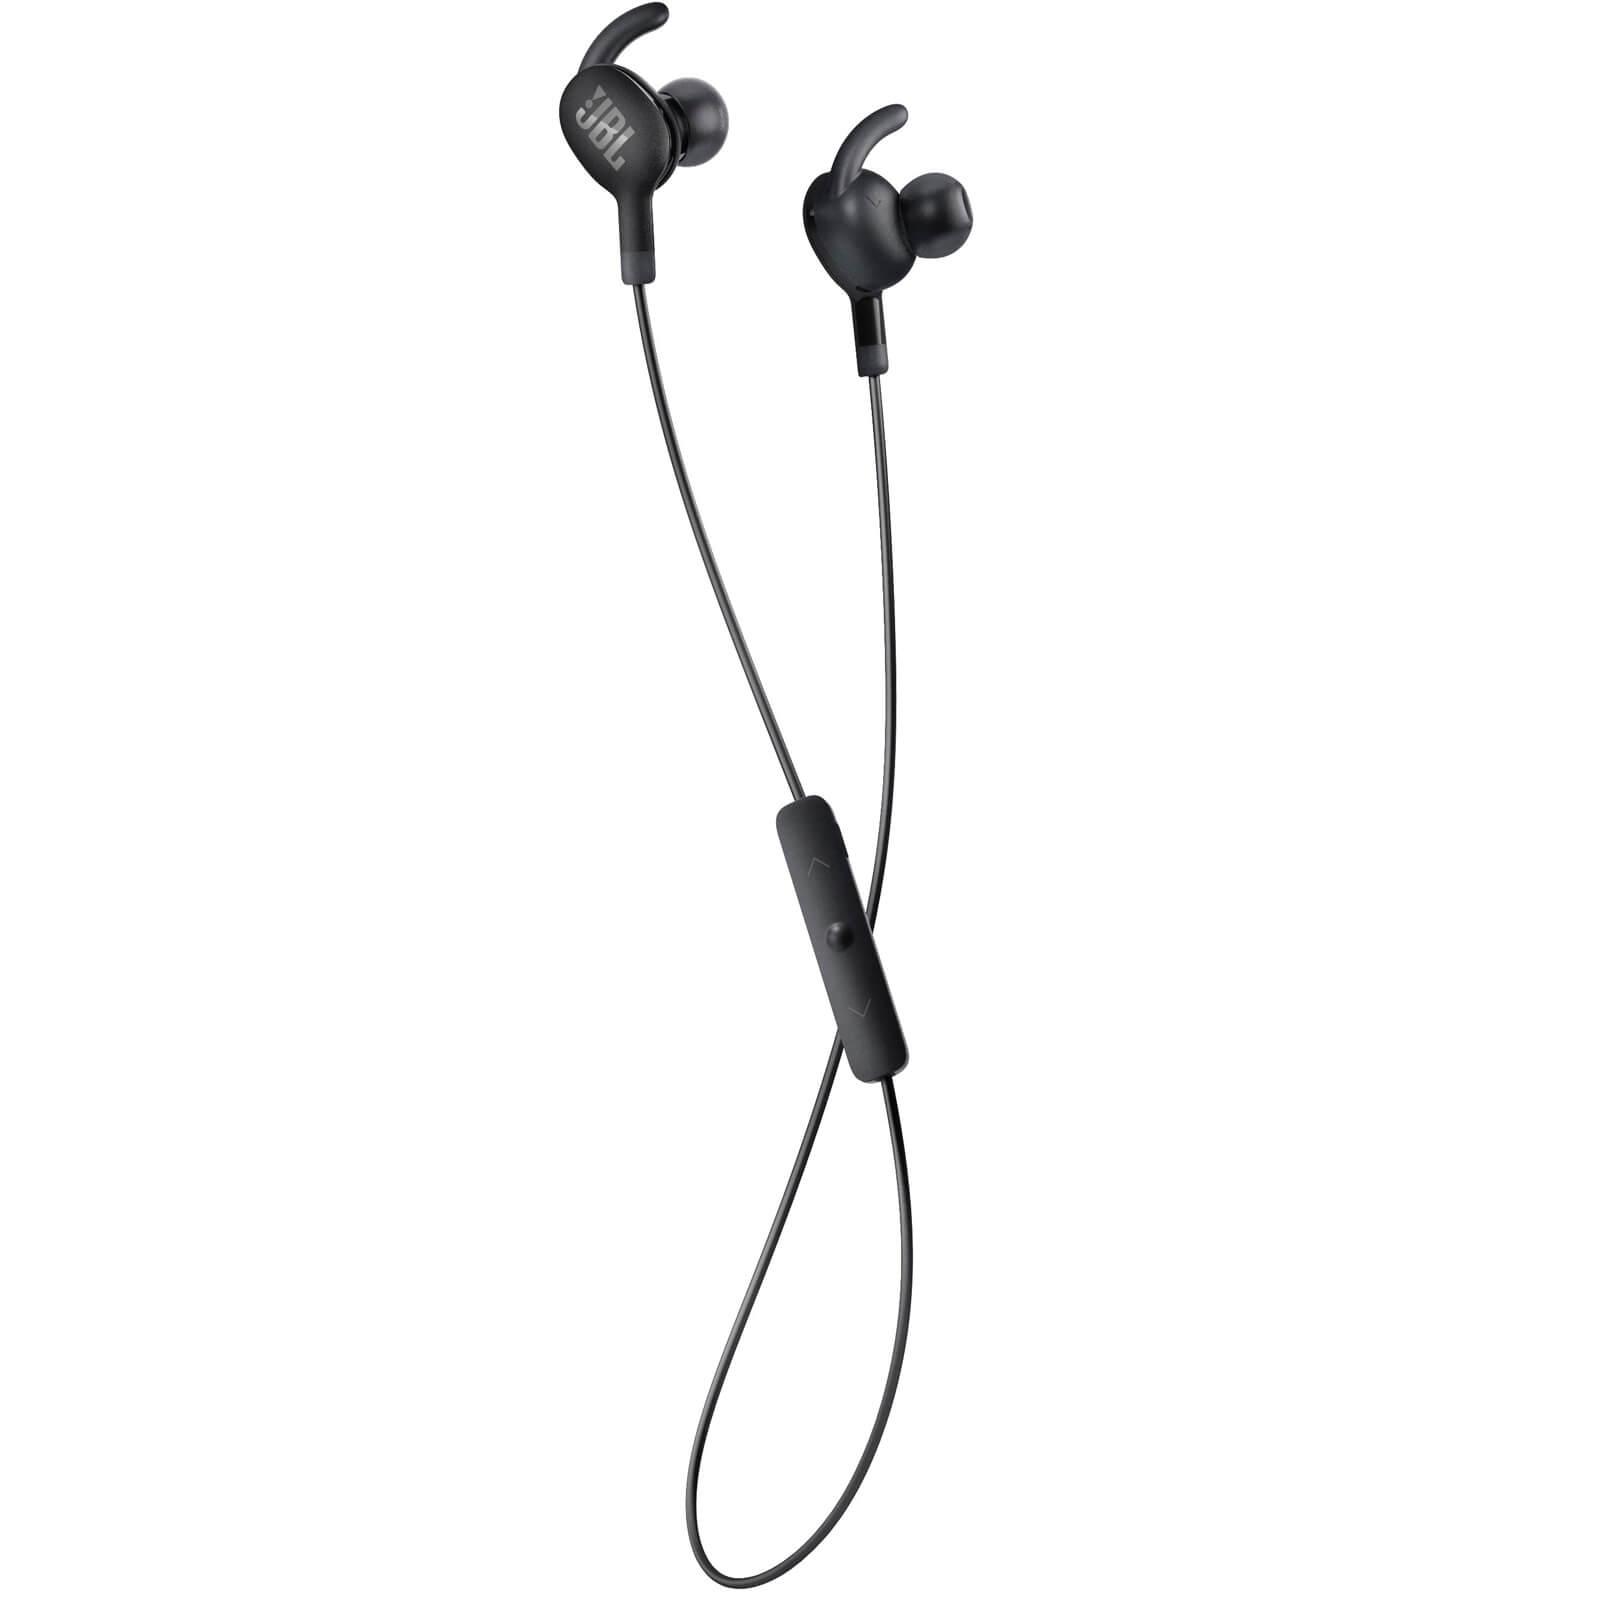 Earphones bluetooth wireless with speaker - earphones with microphone switch